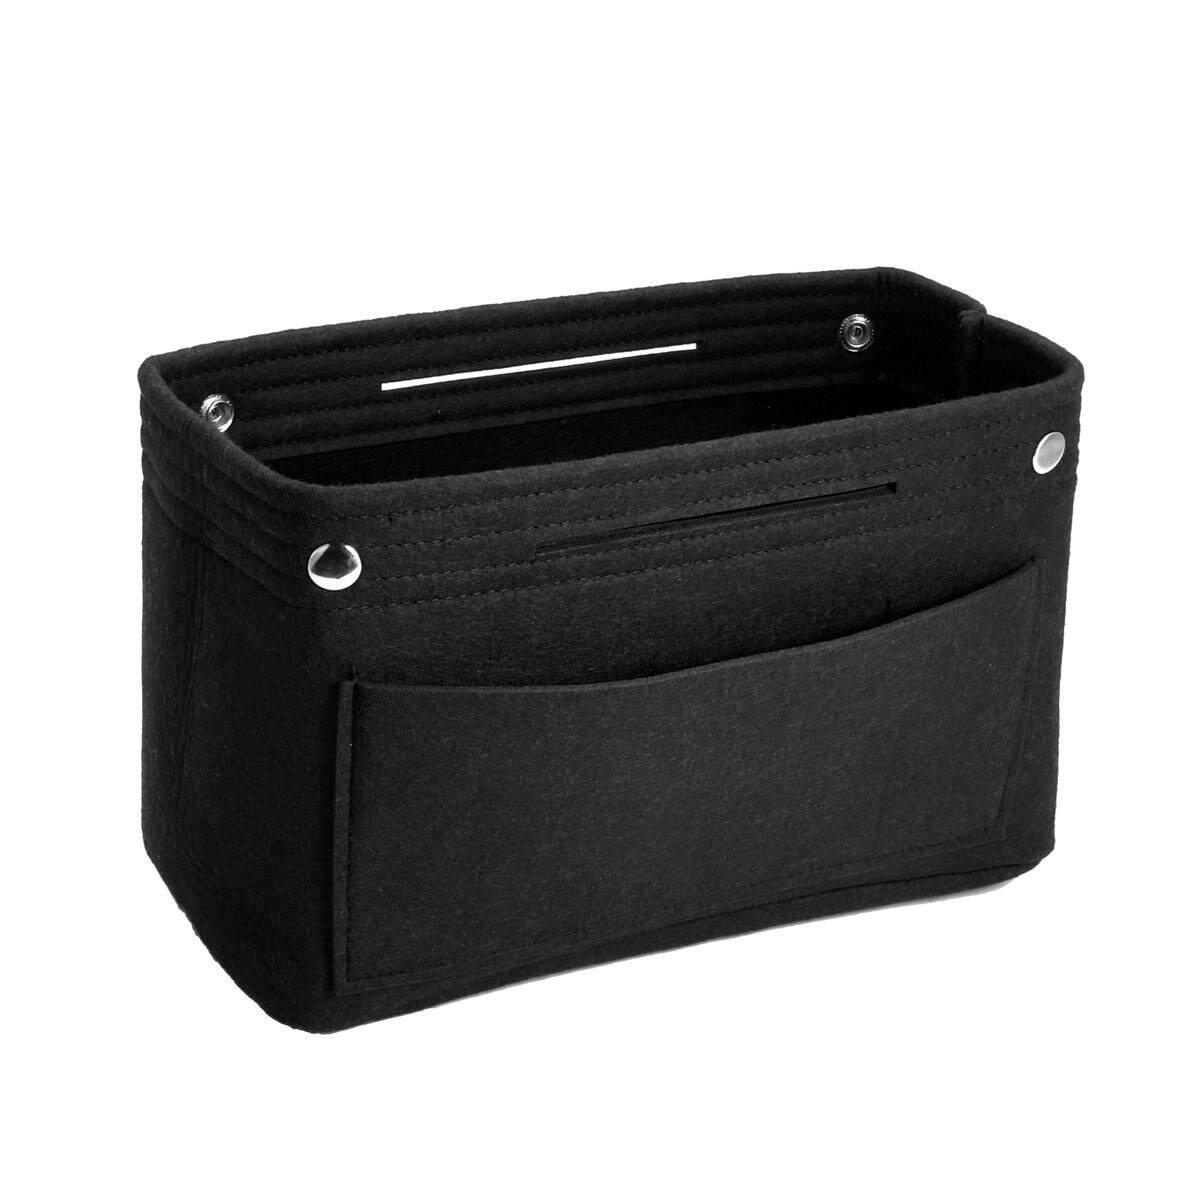 Felt Insert Handbag Organizer Travel Purse Bag Organizer Storage Large Color BLACK 37X28X18x10.5cm - intl